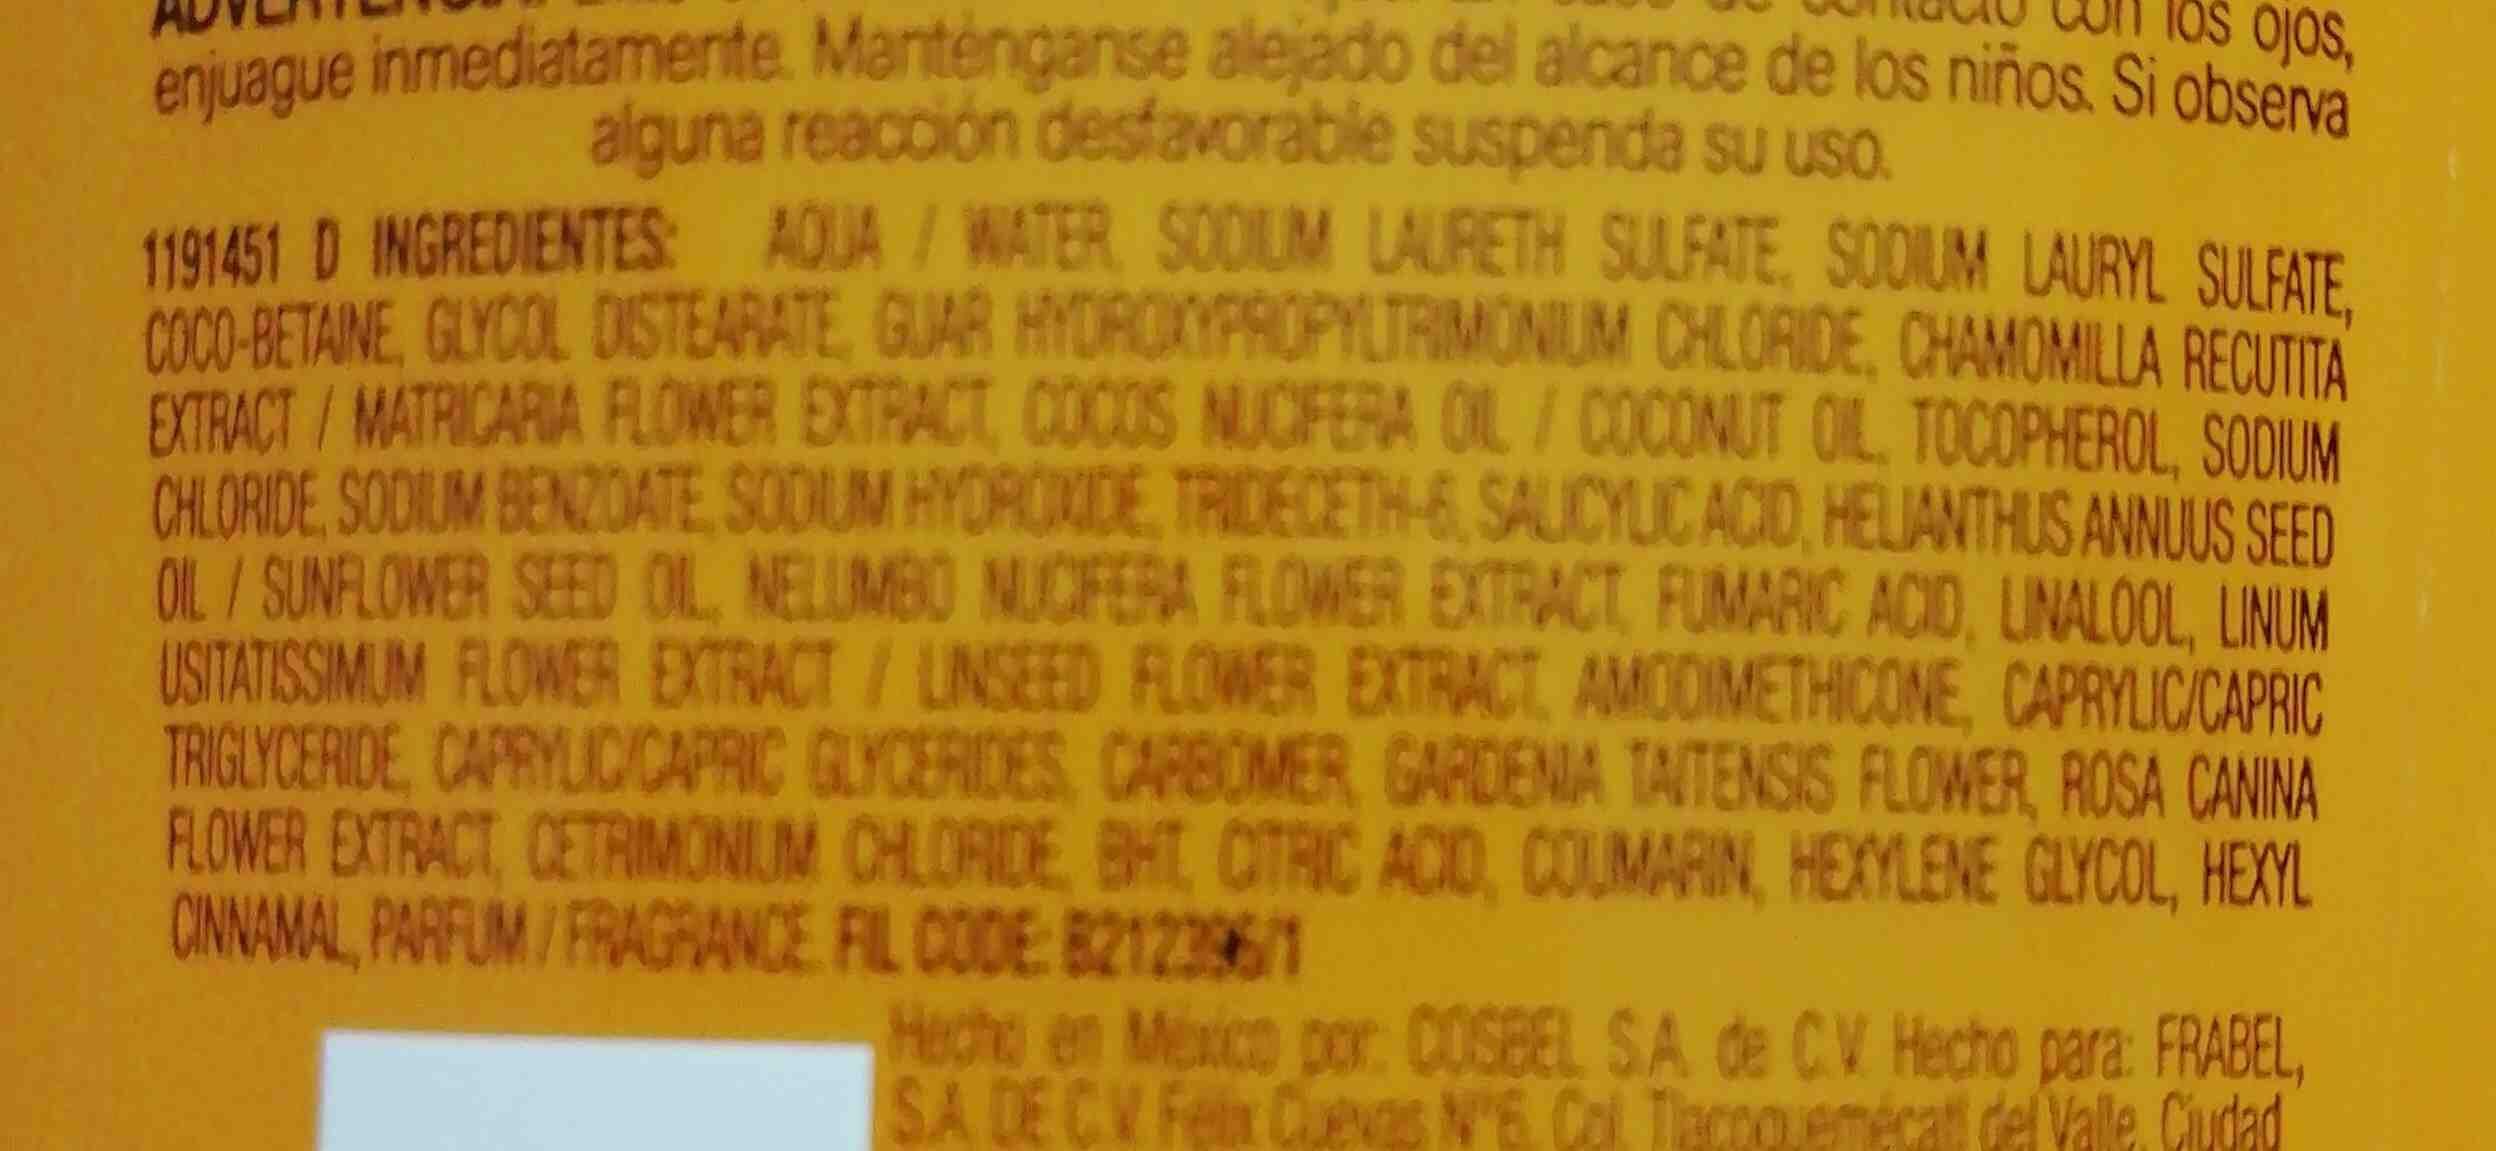 Elvive oleo extraordinario shampoo - Ingredients - en